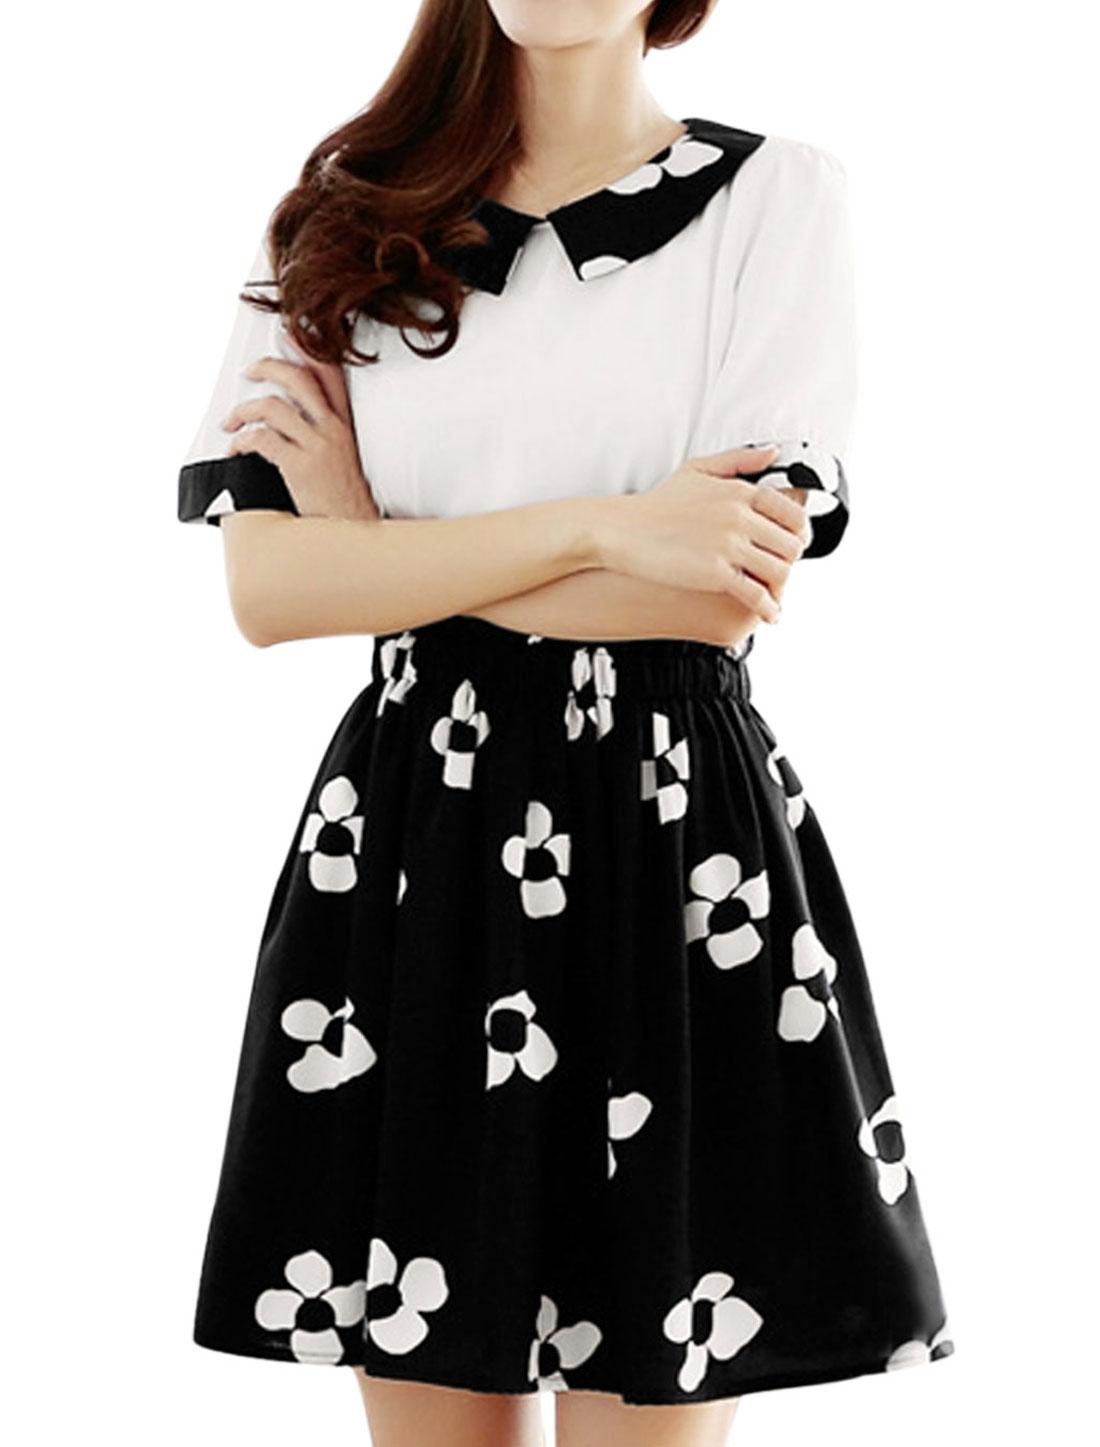 Lady Layered Design Floral Print Elastic Waist Chiffon Dress Black White XS